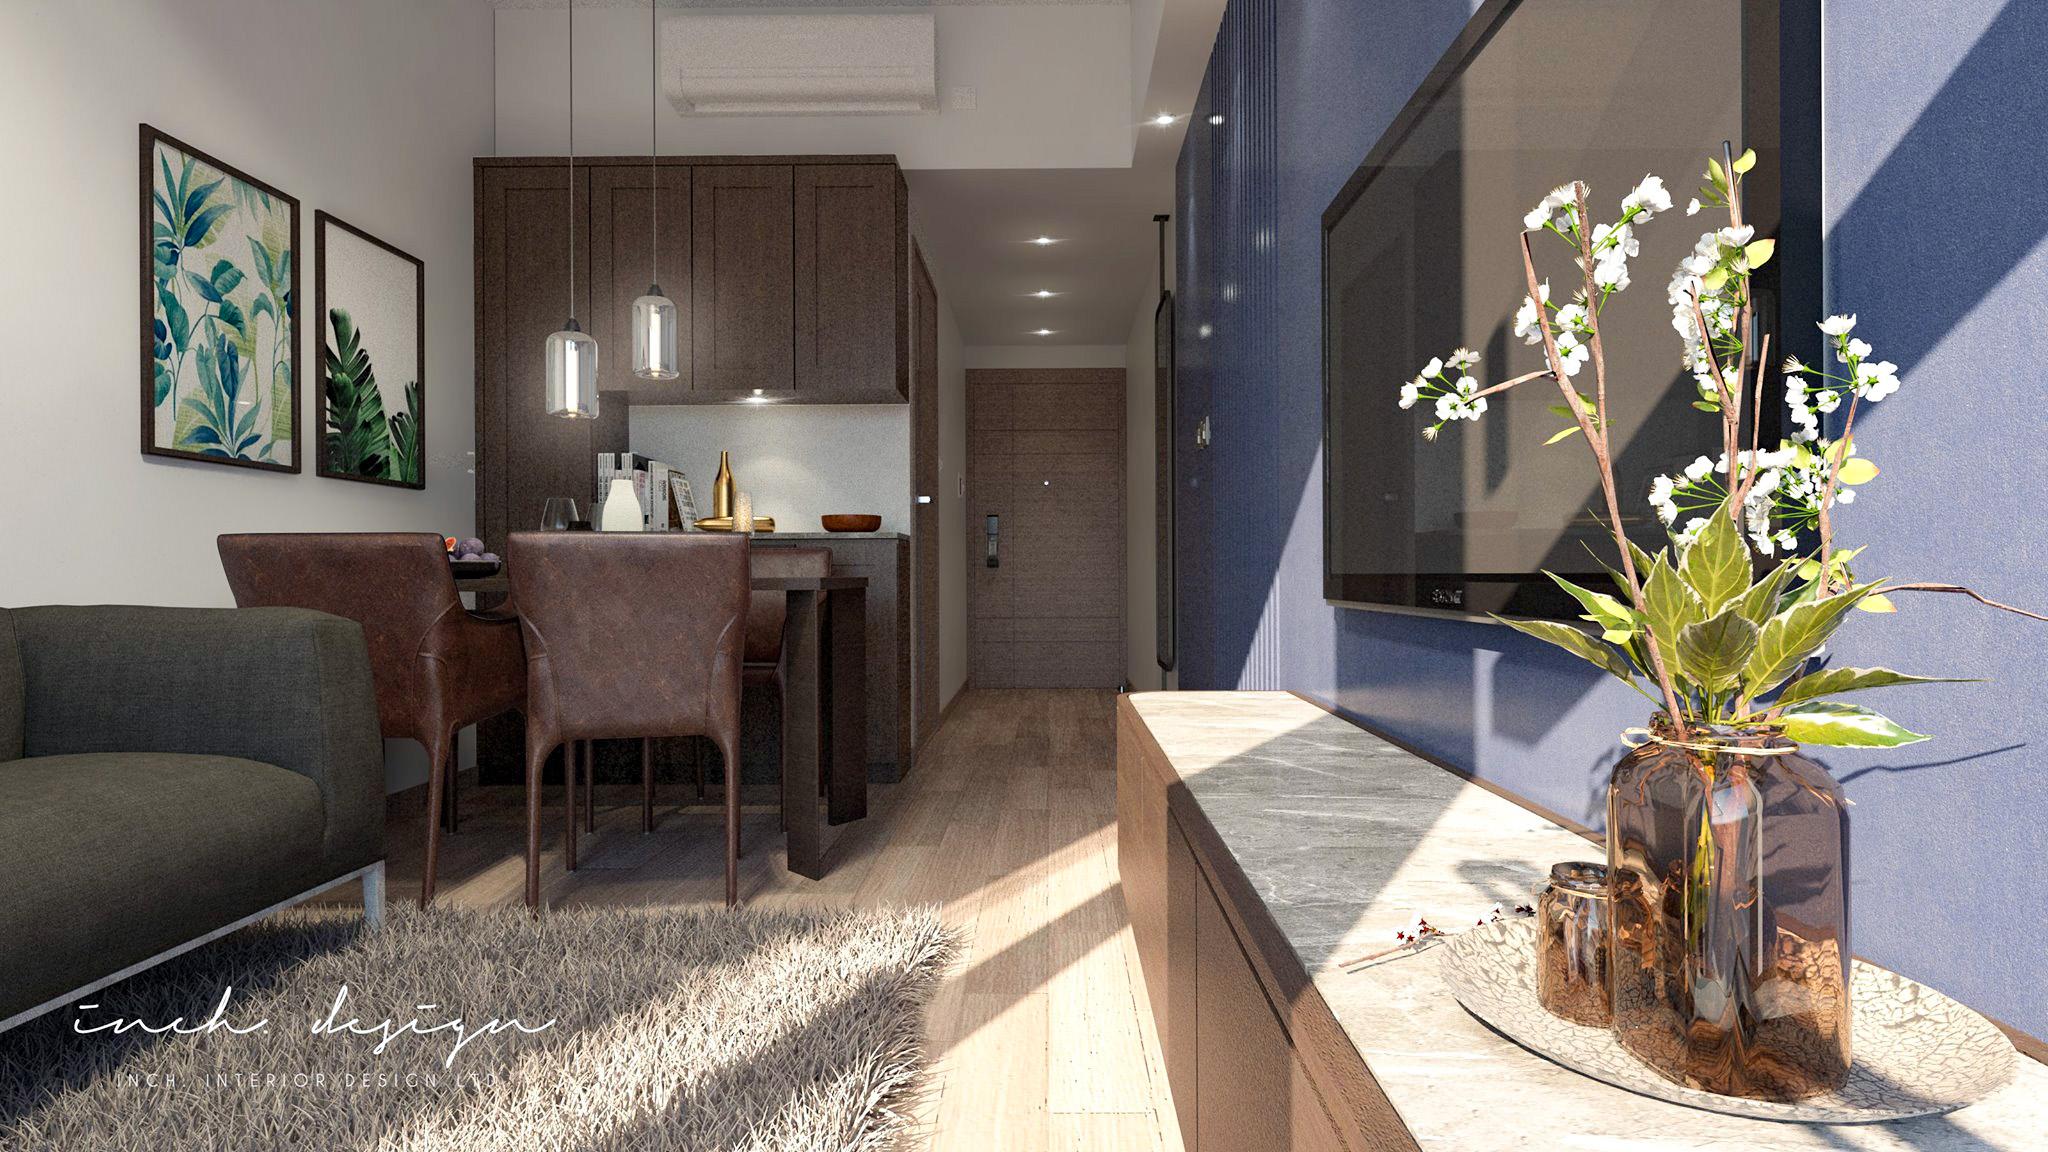 Inch Interior Design Victoria Skye Concept Image 001